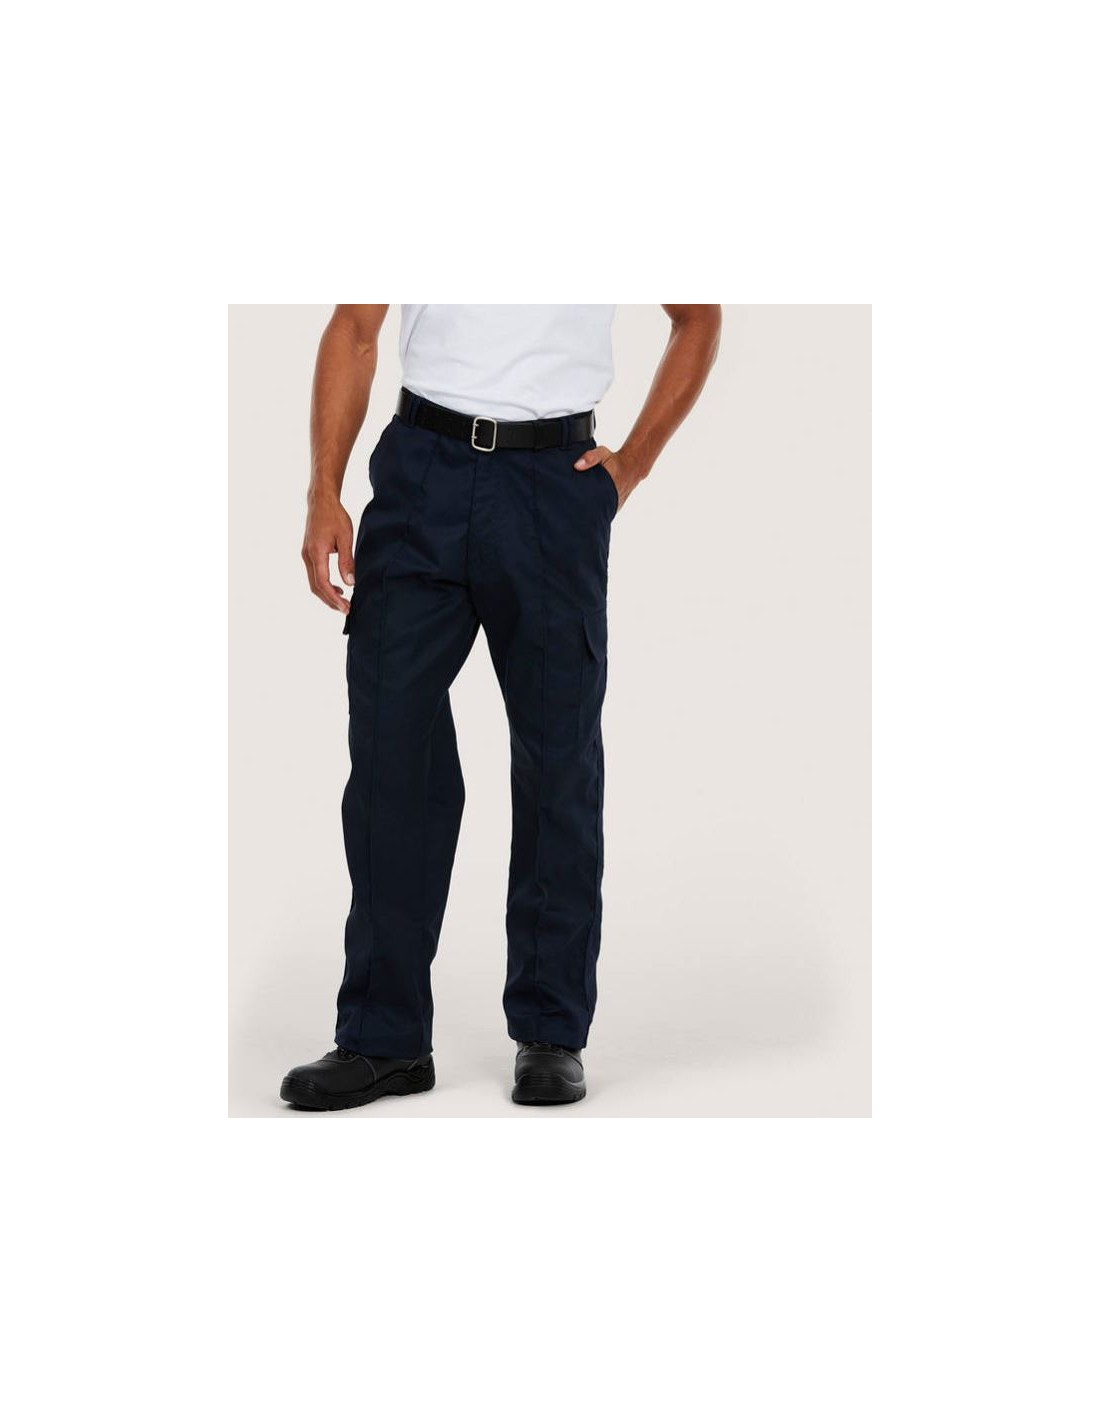 Cargo Brand New Uneek UC902 Workwear Combat Trousers Navy Size 32 Regular